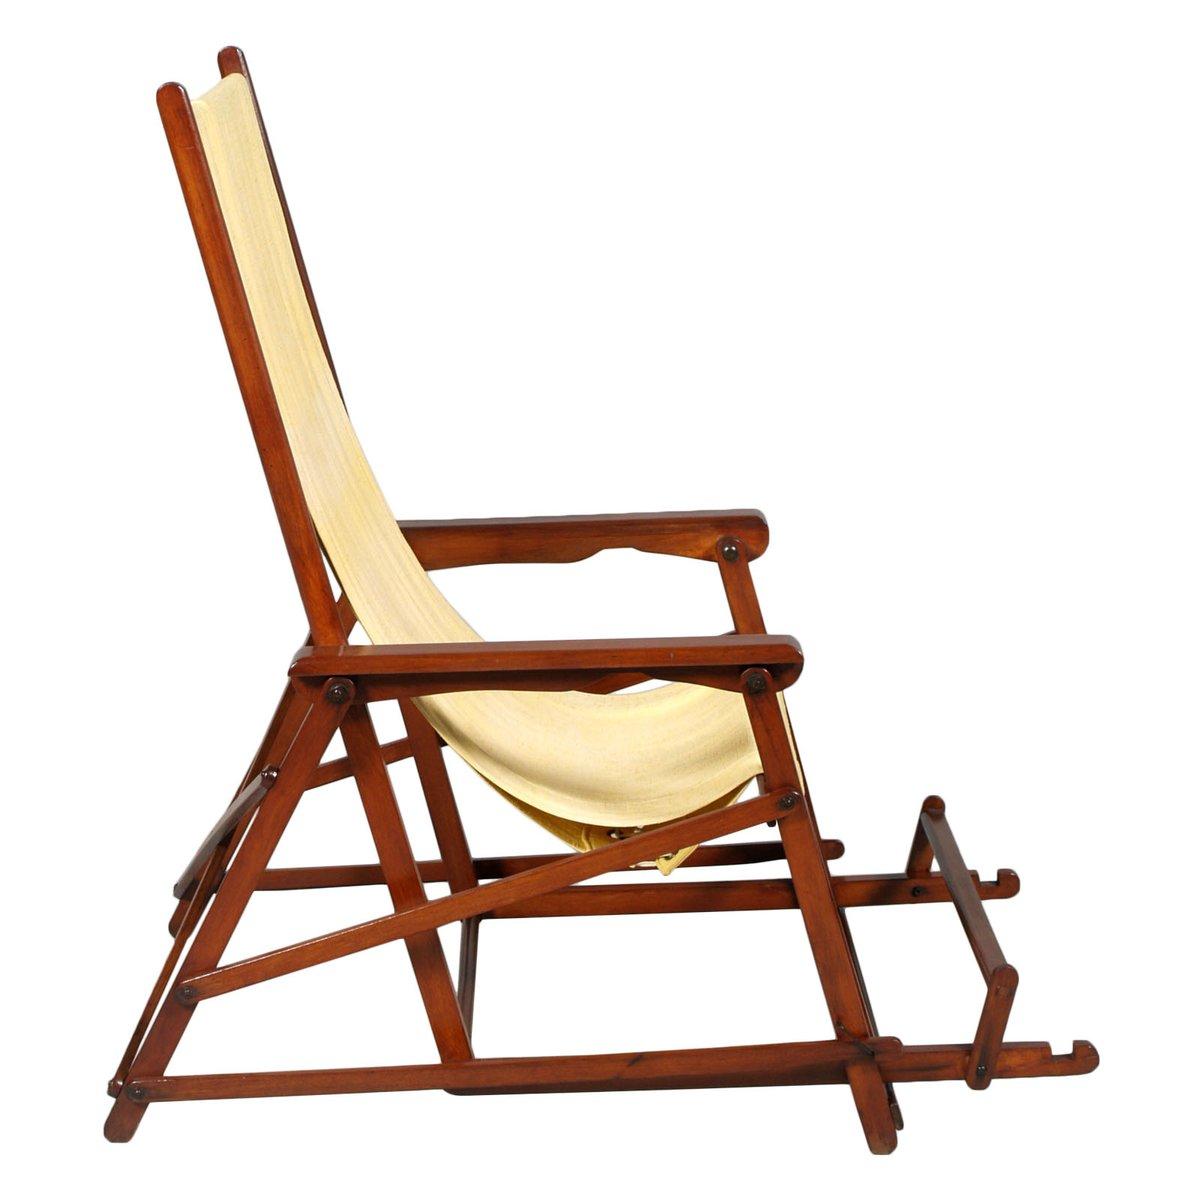 chaise longue pliante mid century en toile de clairitex france en vente sur pamono. Black Bedroom Furniture Sets. Home Design Ideas